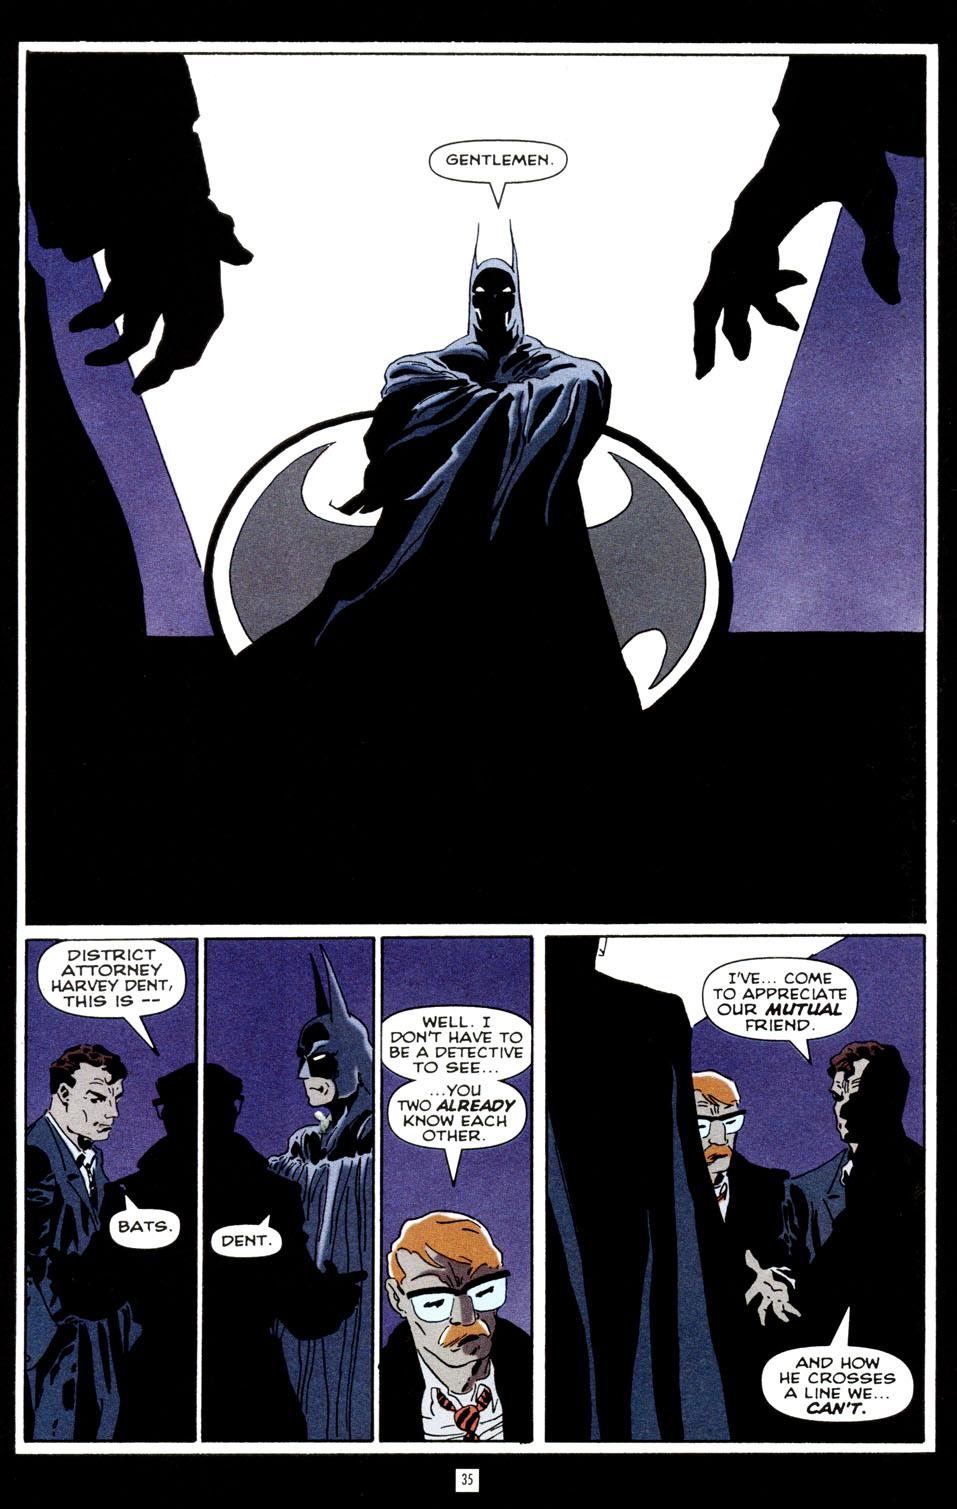 Dracula vs batman latino dating 3